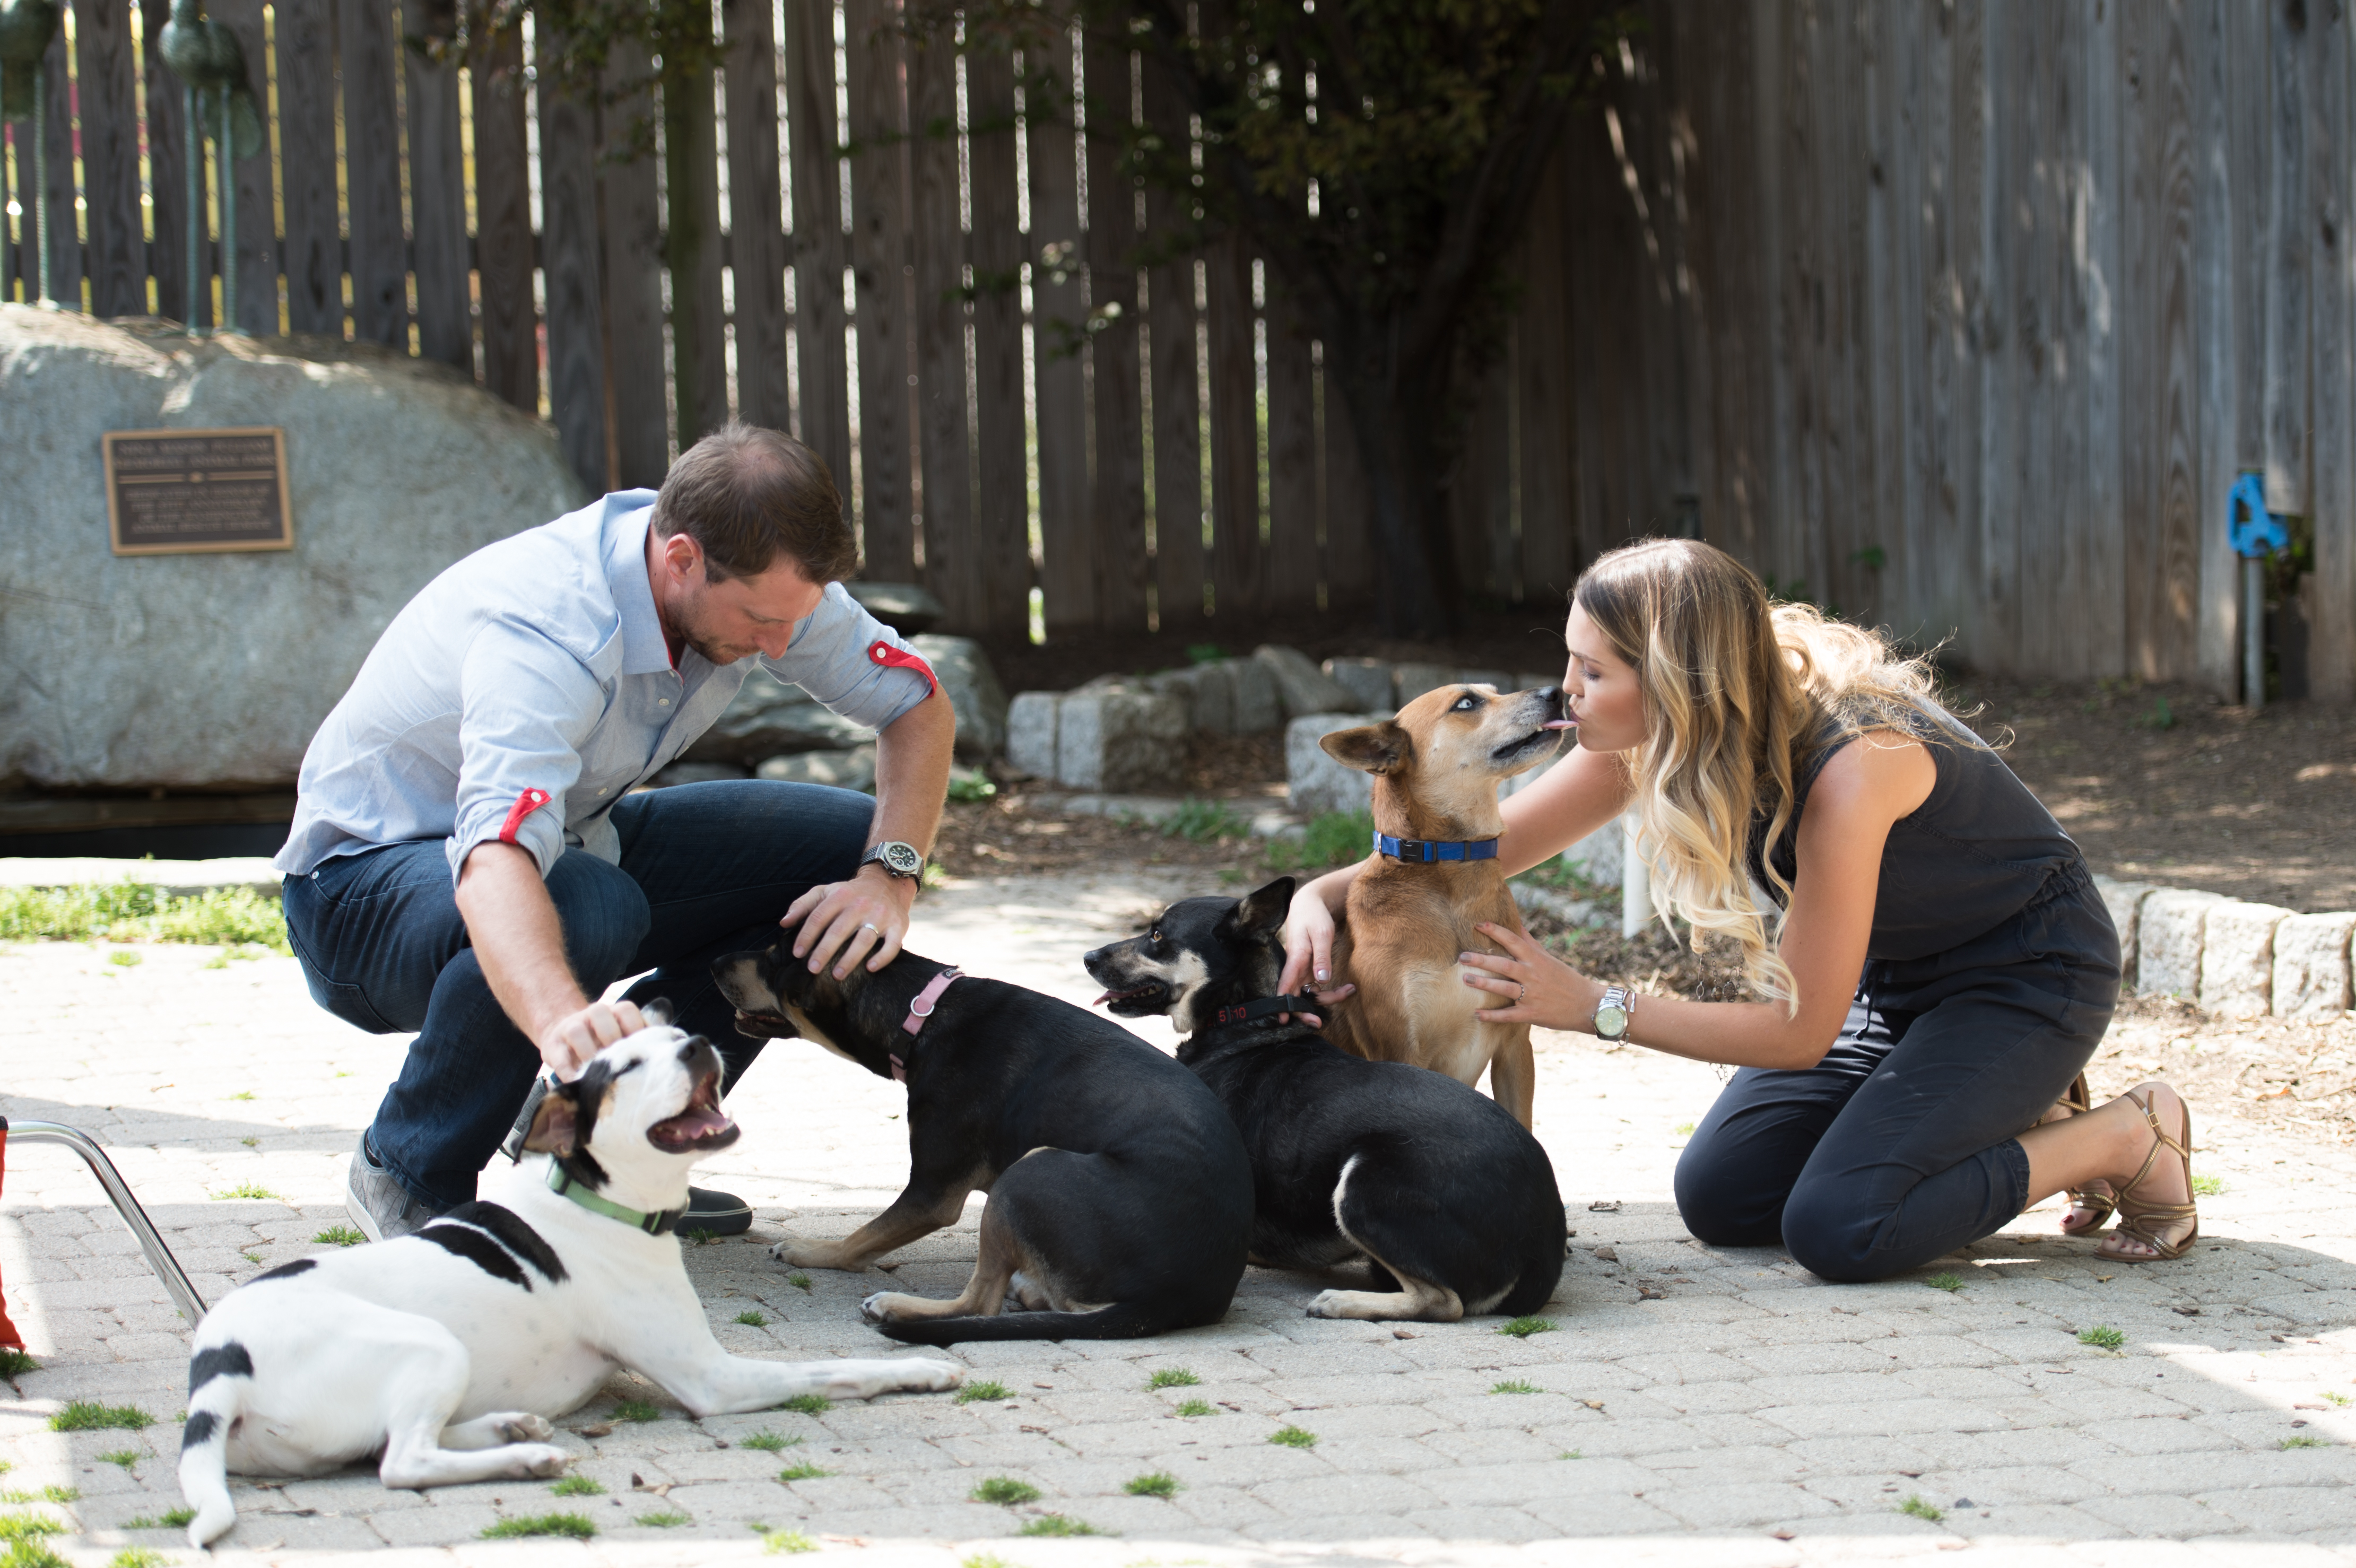 All-Star Pitcher Max Scherzer and Erica Scherzer with their dogs at the Humane Rescue Alliance